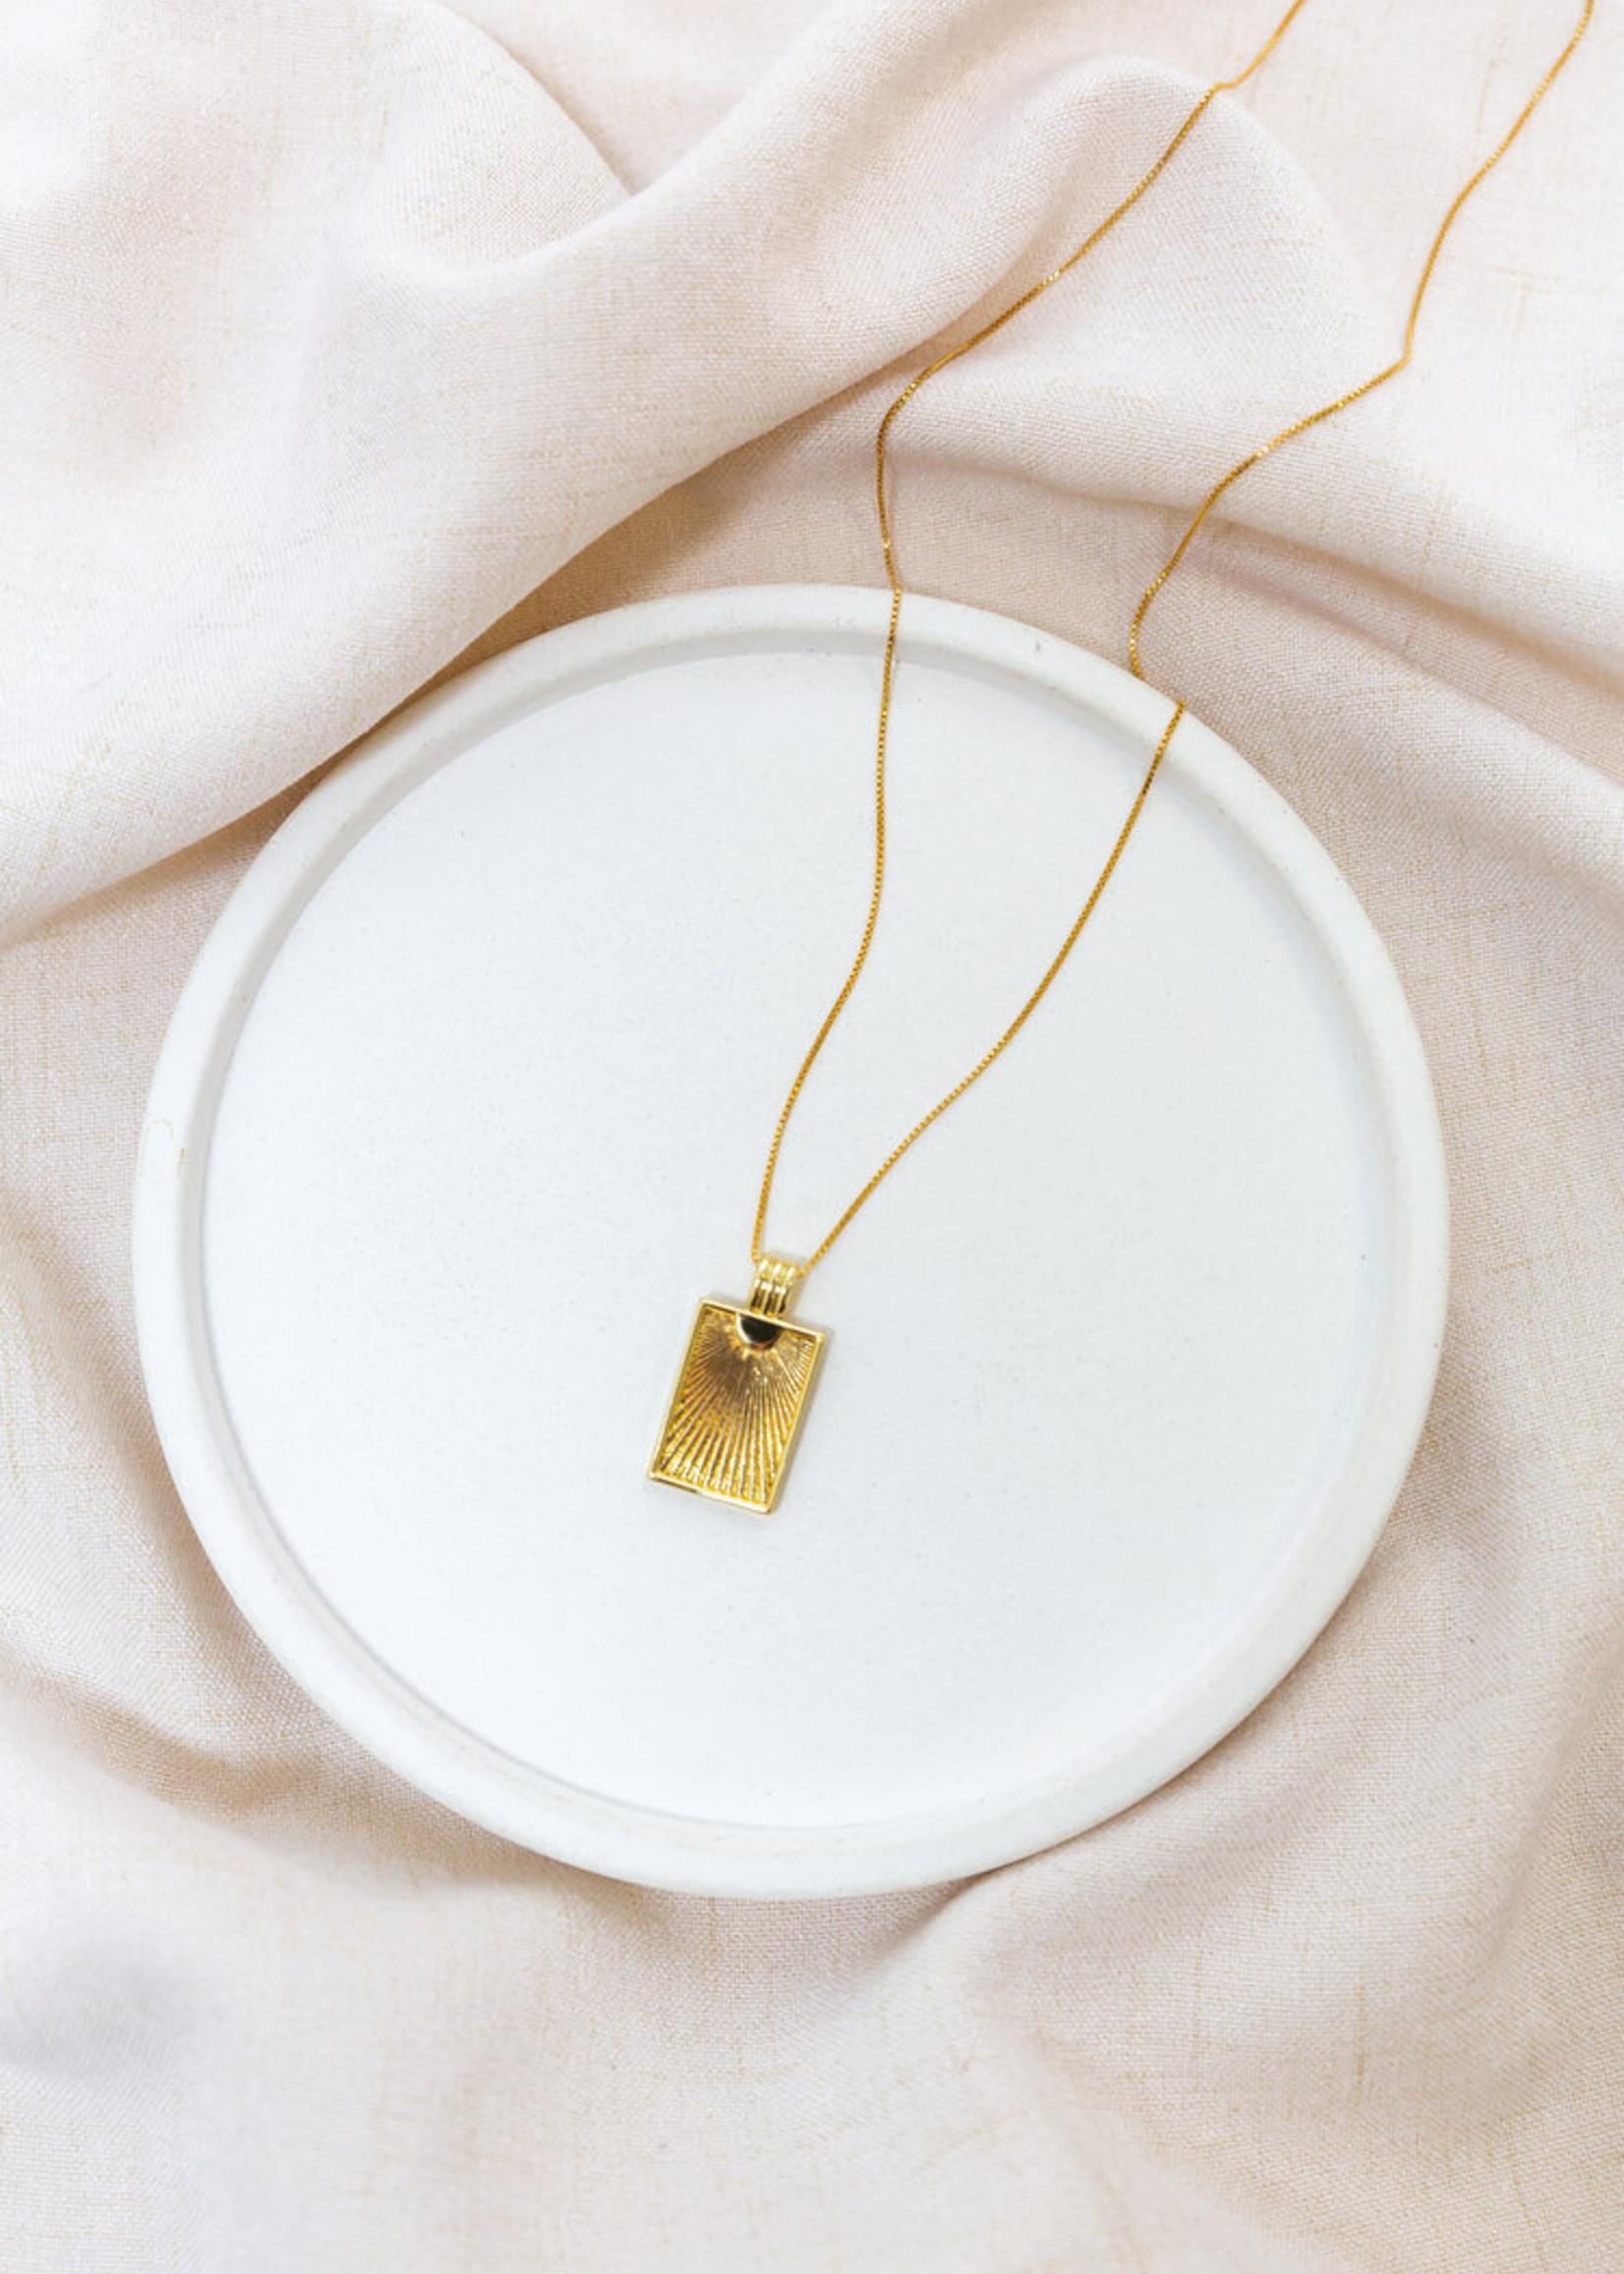 Elizabeth Lyn Jewelry Elizabeth Lyn  Gold Harvest Necklace